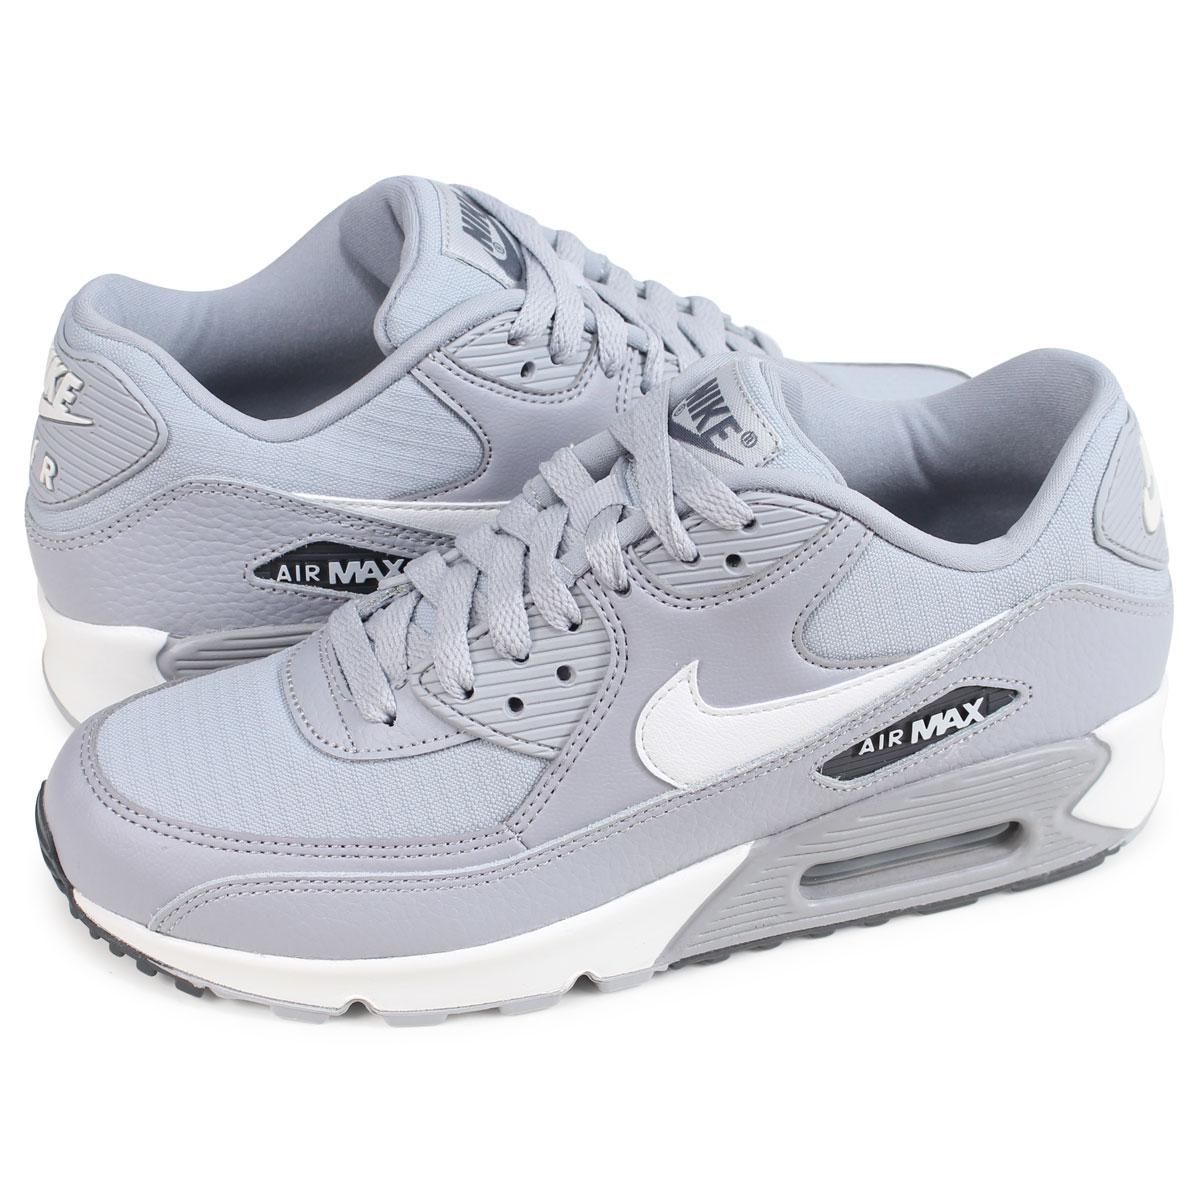 f8af42b1cd654 Nike NIKE Air Max 90 sneakers Lady's men WMNS AIR MAX 90 gray 325,213-062  ...